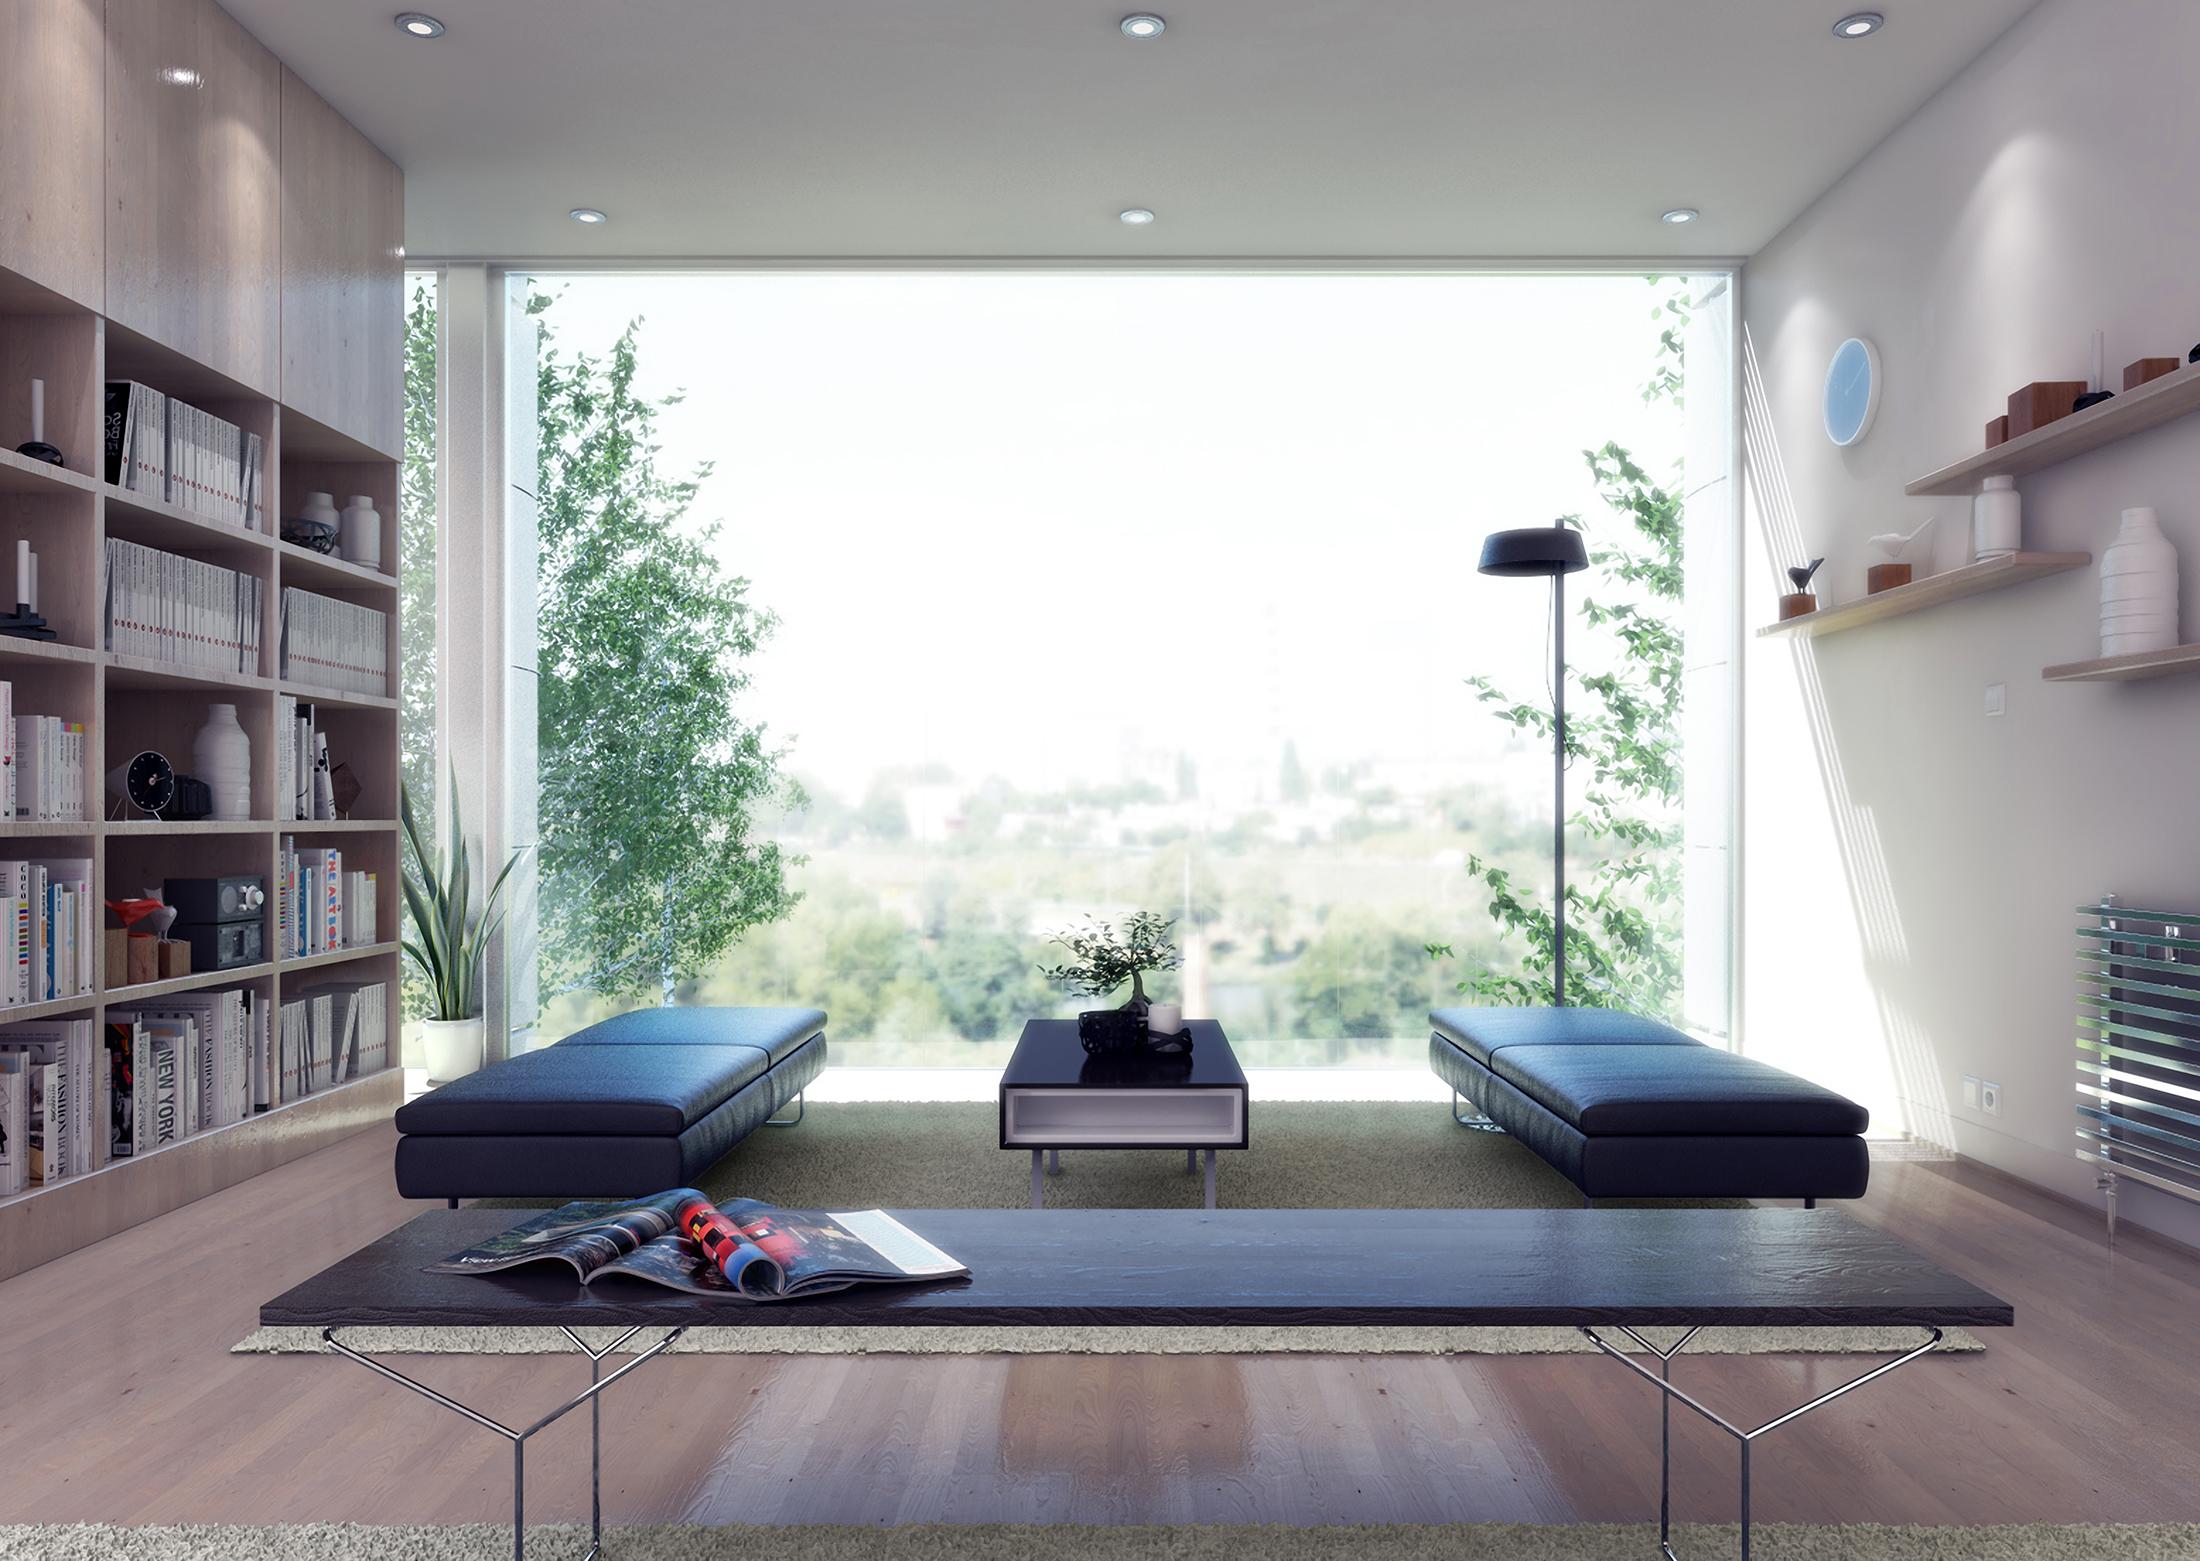 INTERIOR Arriba: Living. Abajo: Librería